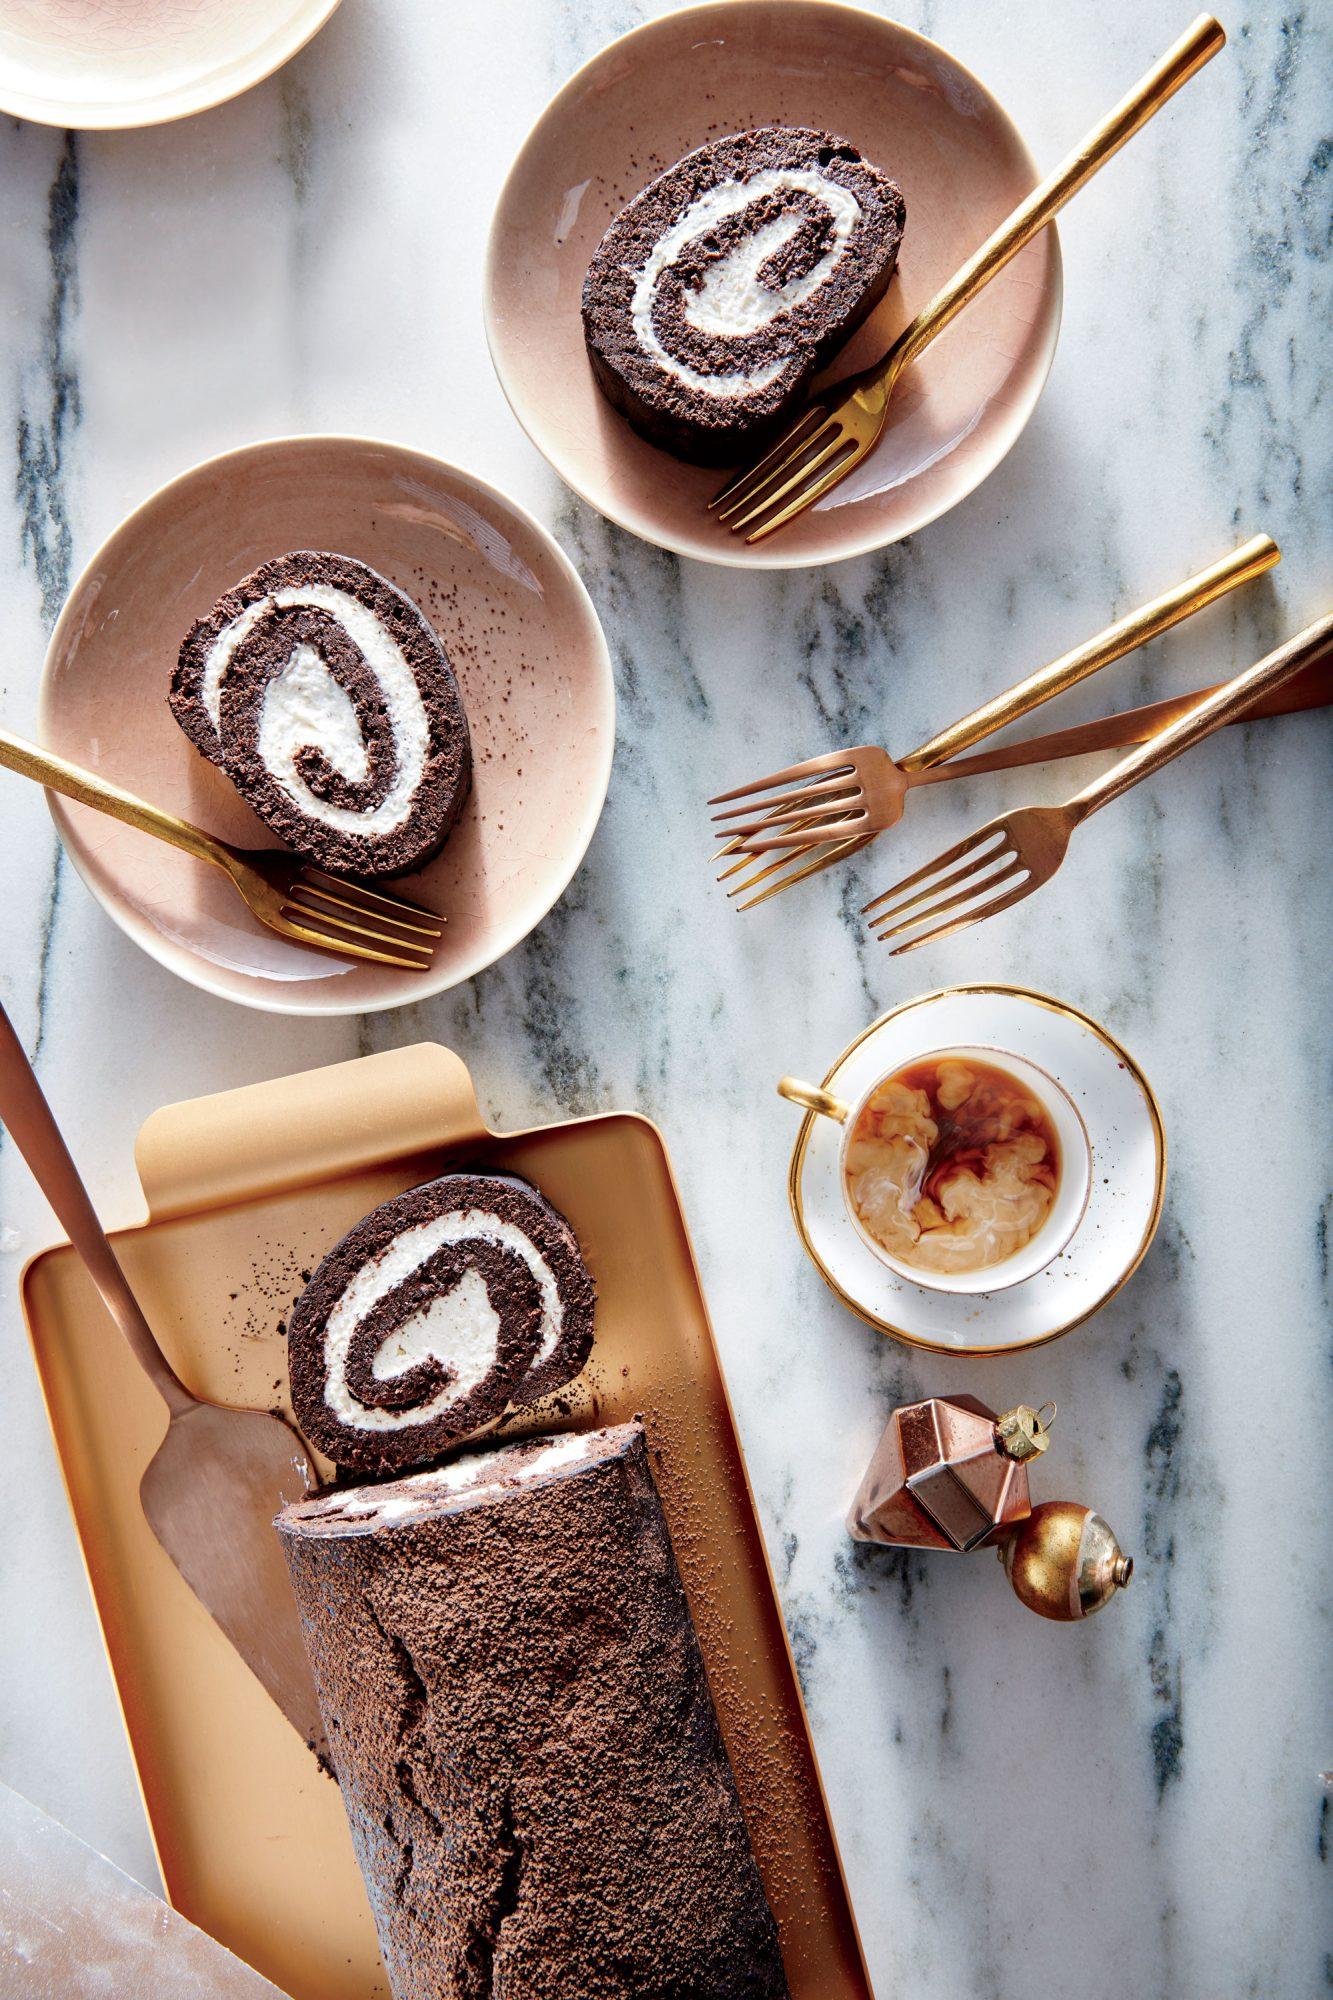 chocolate yule log image - Classic Christmas Desserts